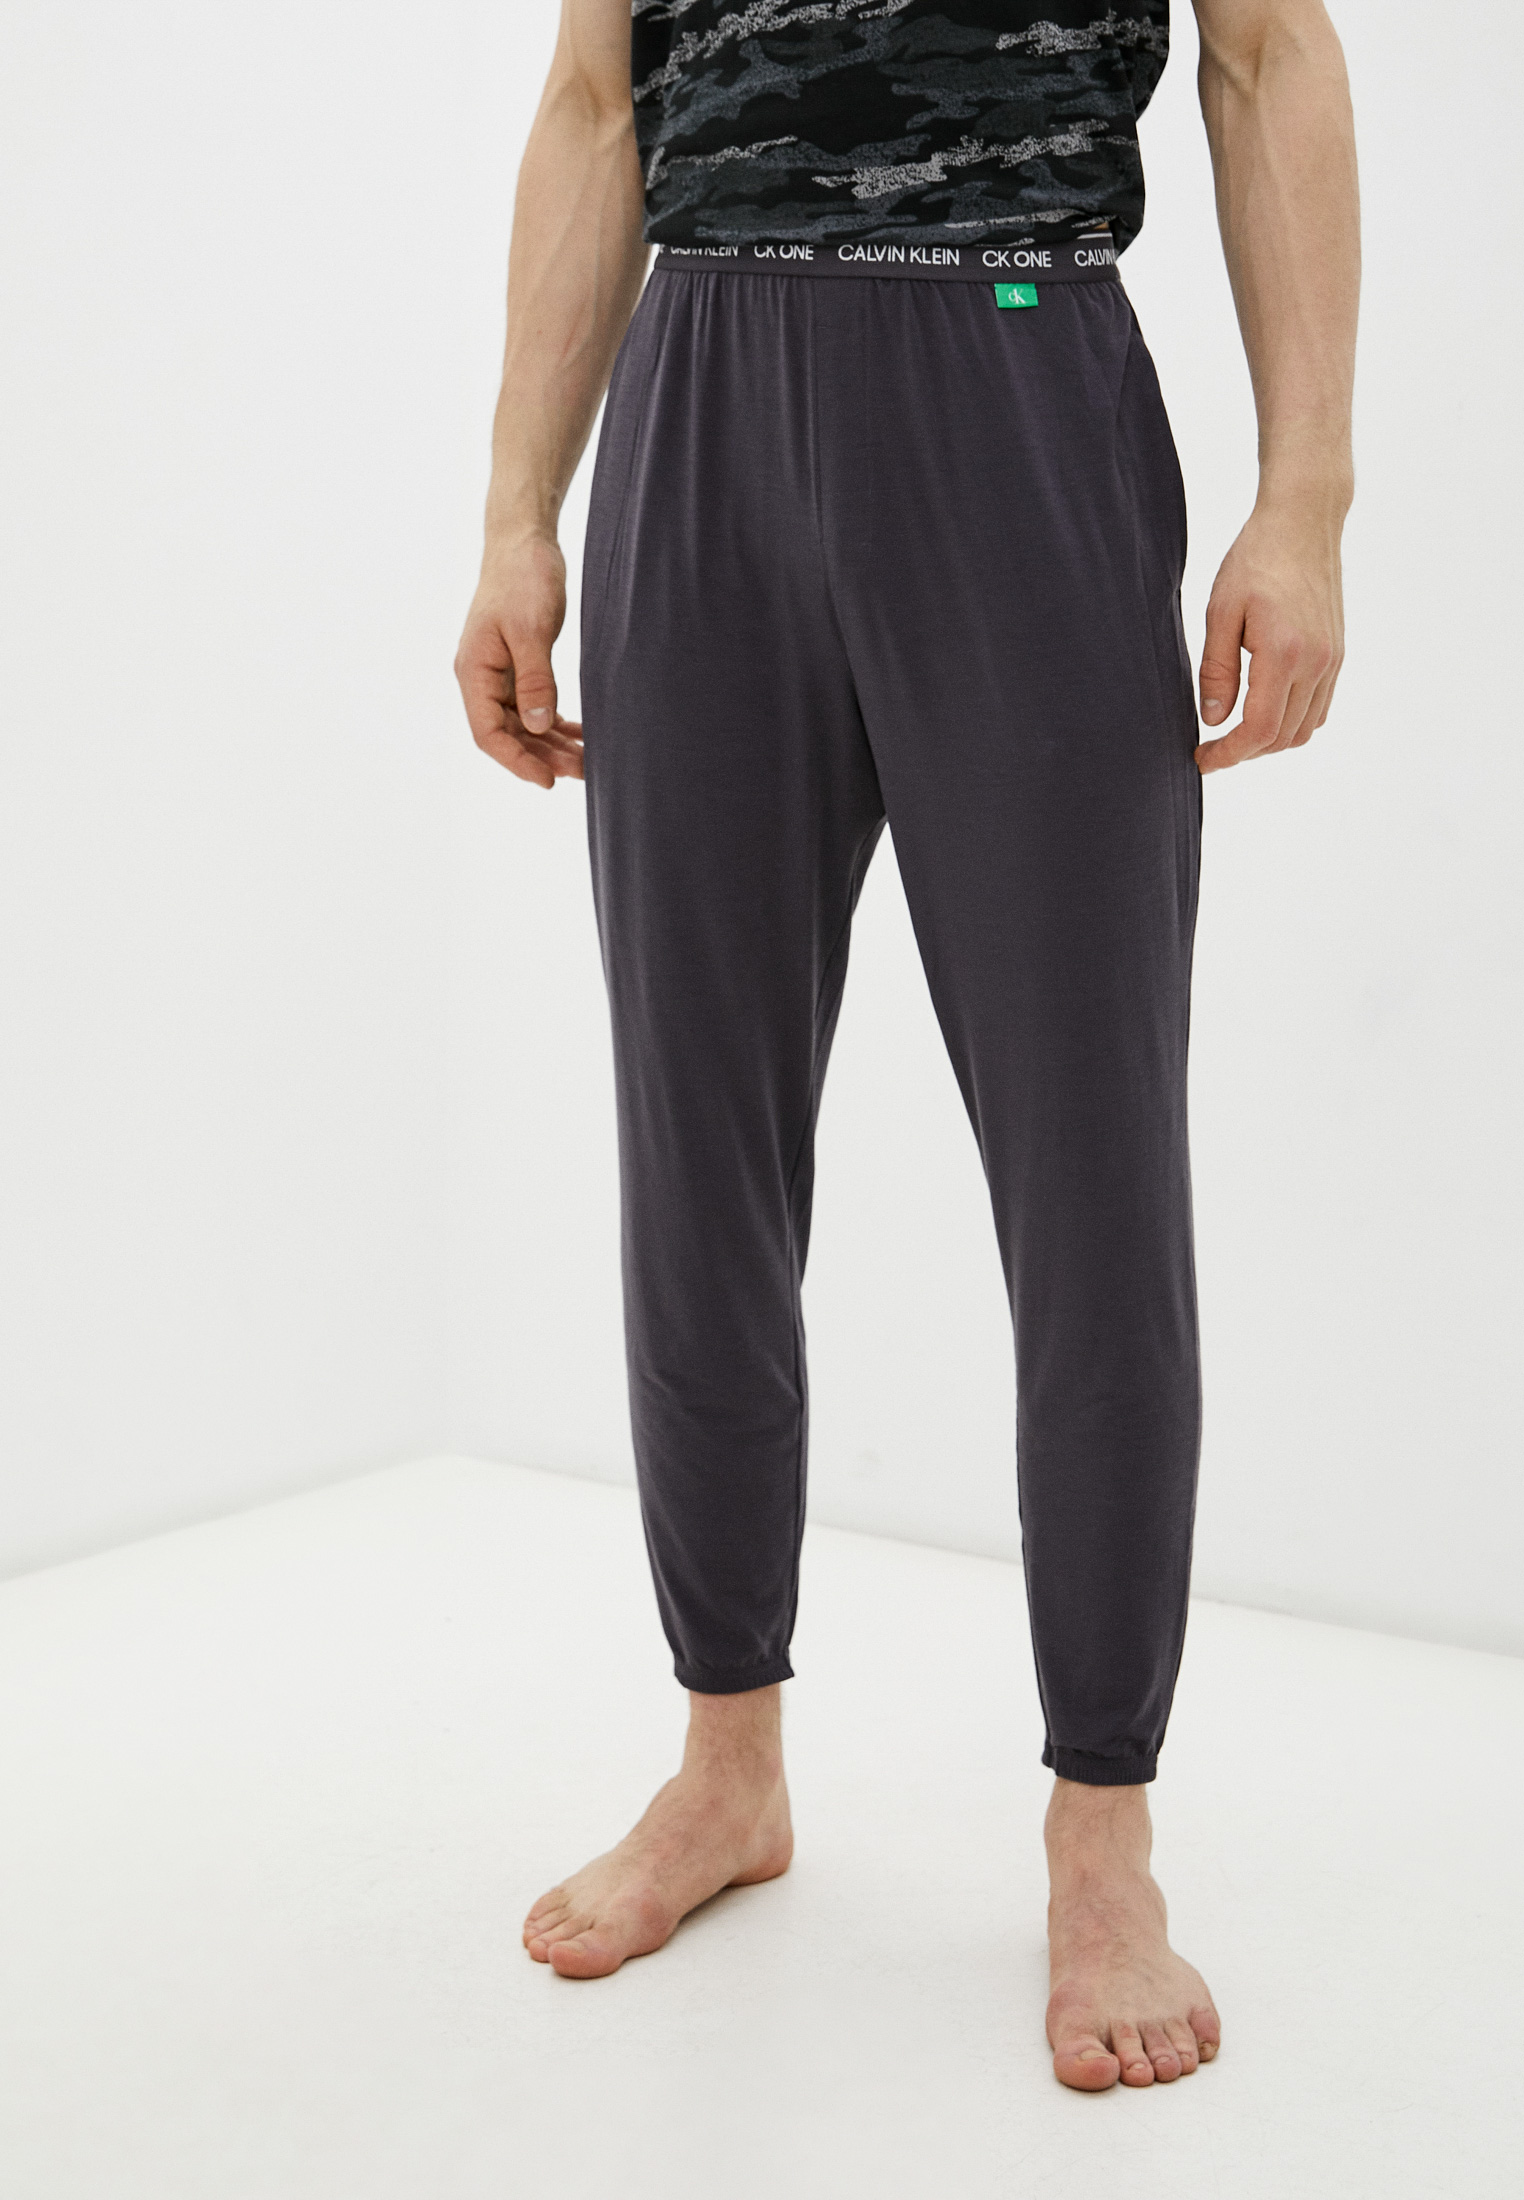 Мужские домашние брюки Calvin Klein Underwear (Кельвин Кляйн Андервеар) NM2001E